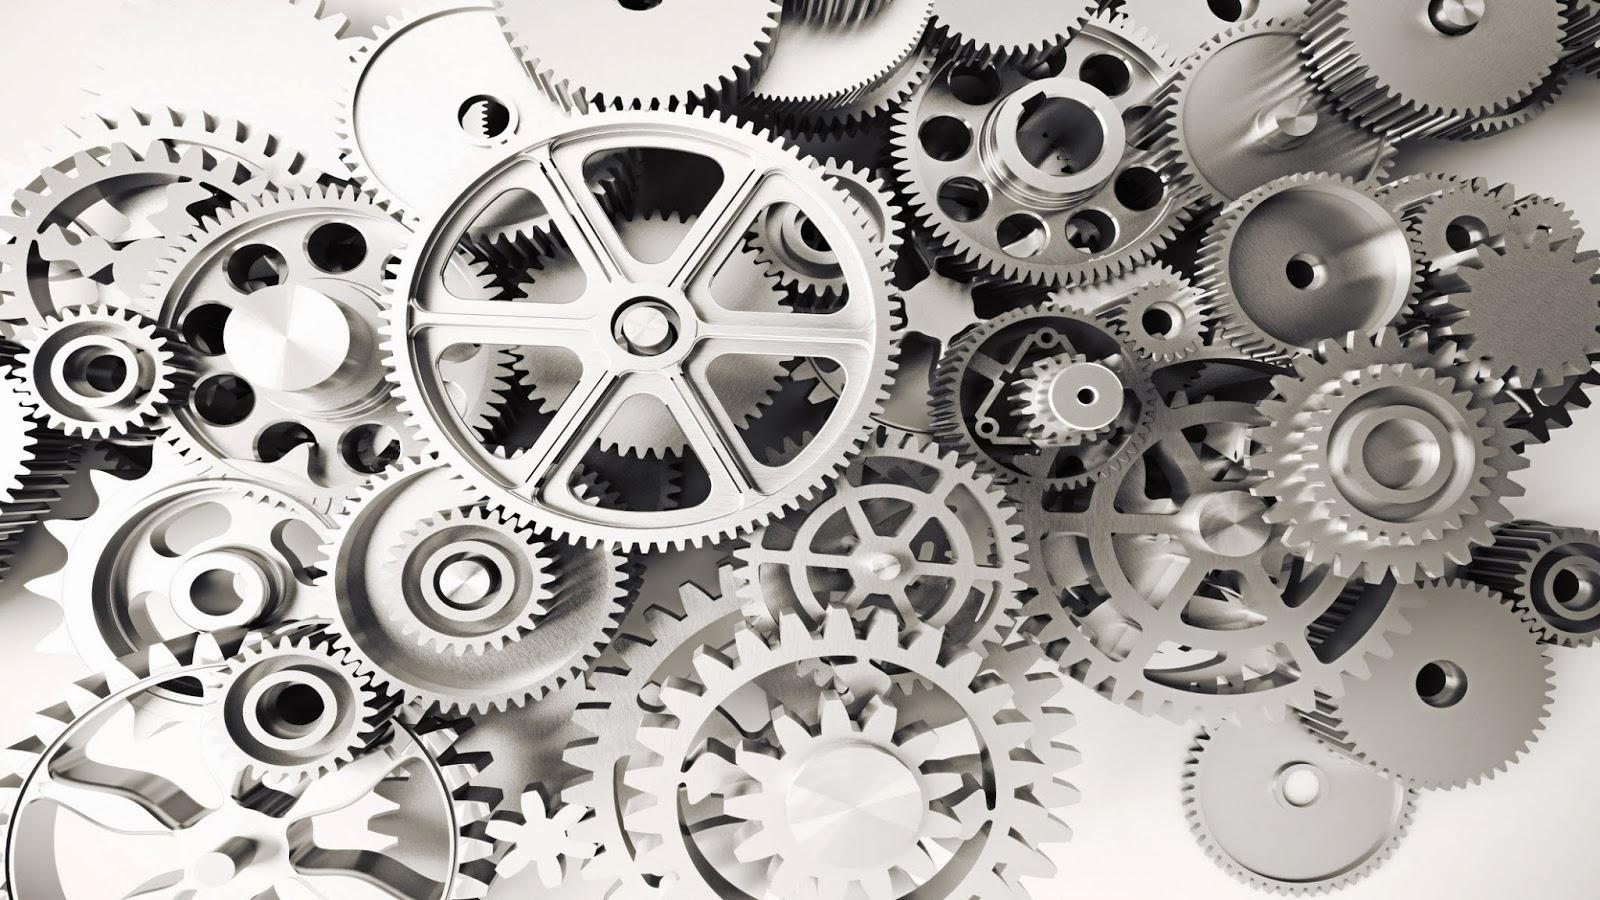 Engineering Latest: Seminar Topics For Mechanical